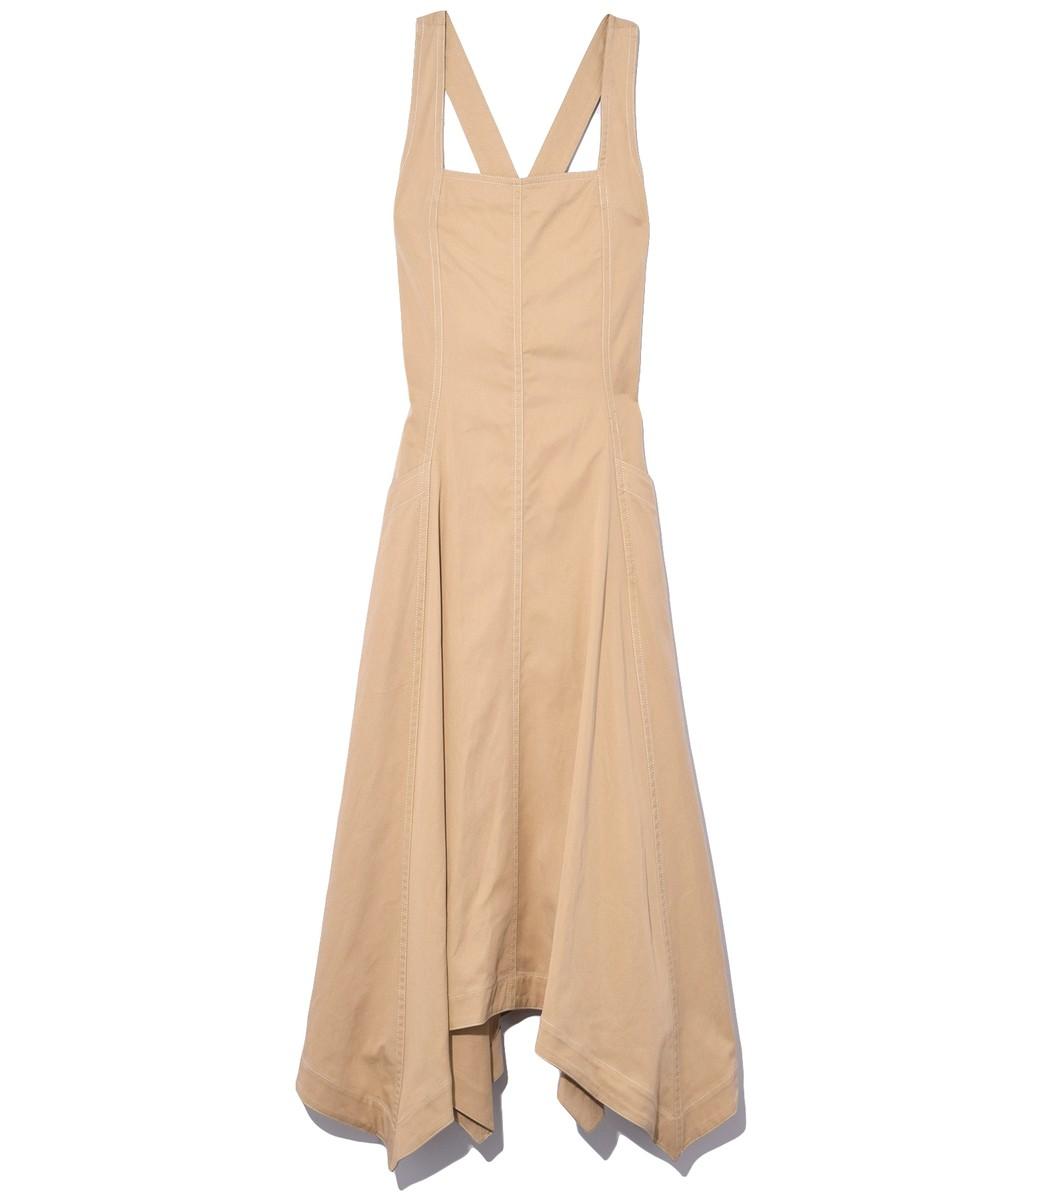 Khaki Cheyenne Dress